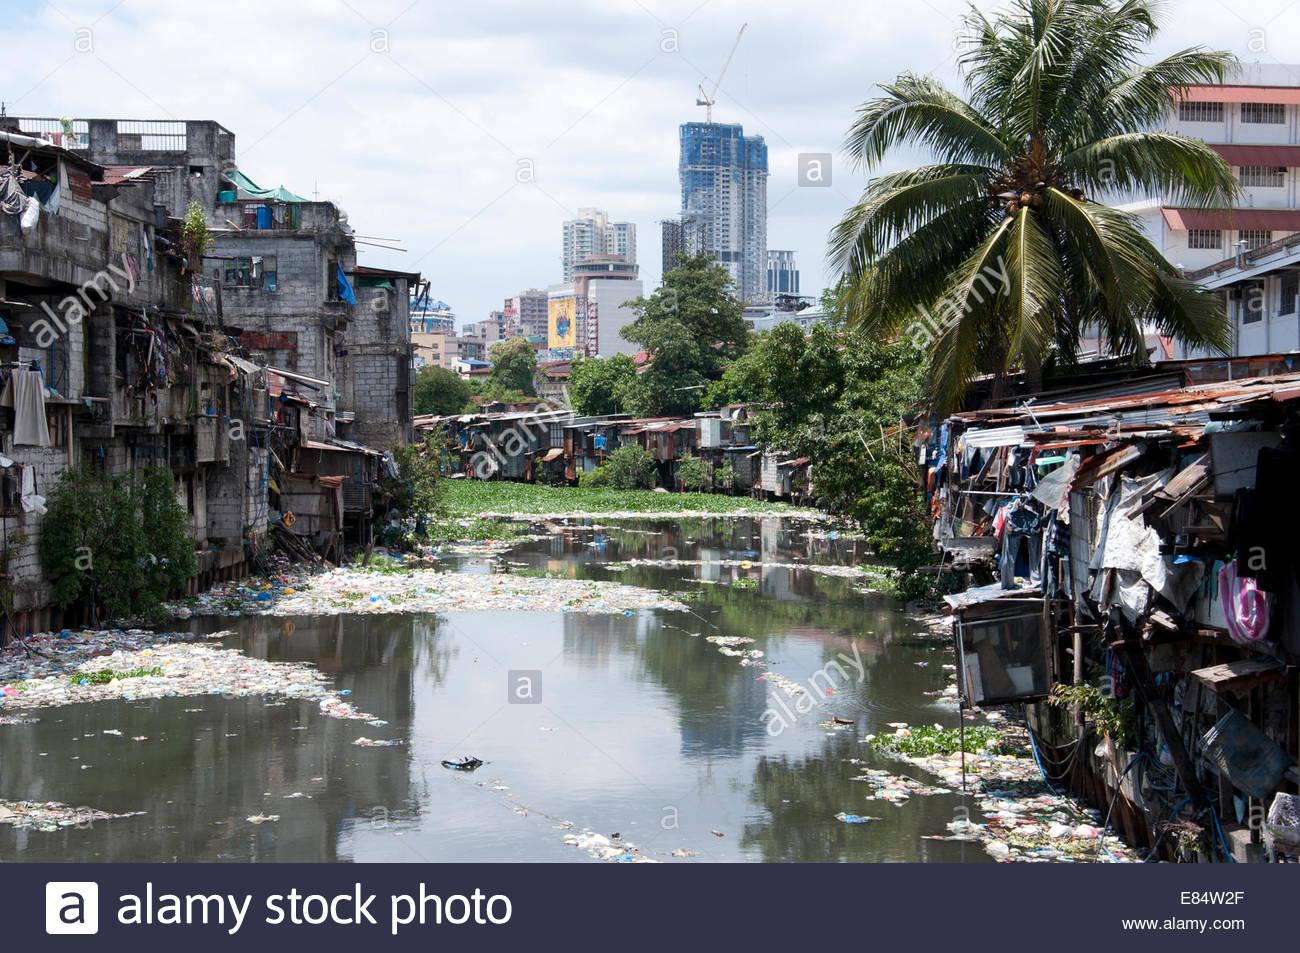 ghetto in the muslim district in manila in the philippines stock